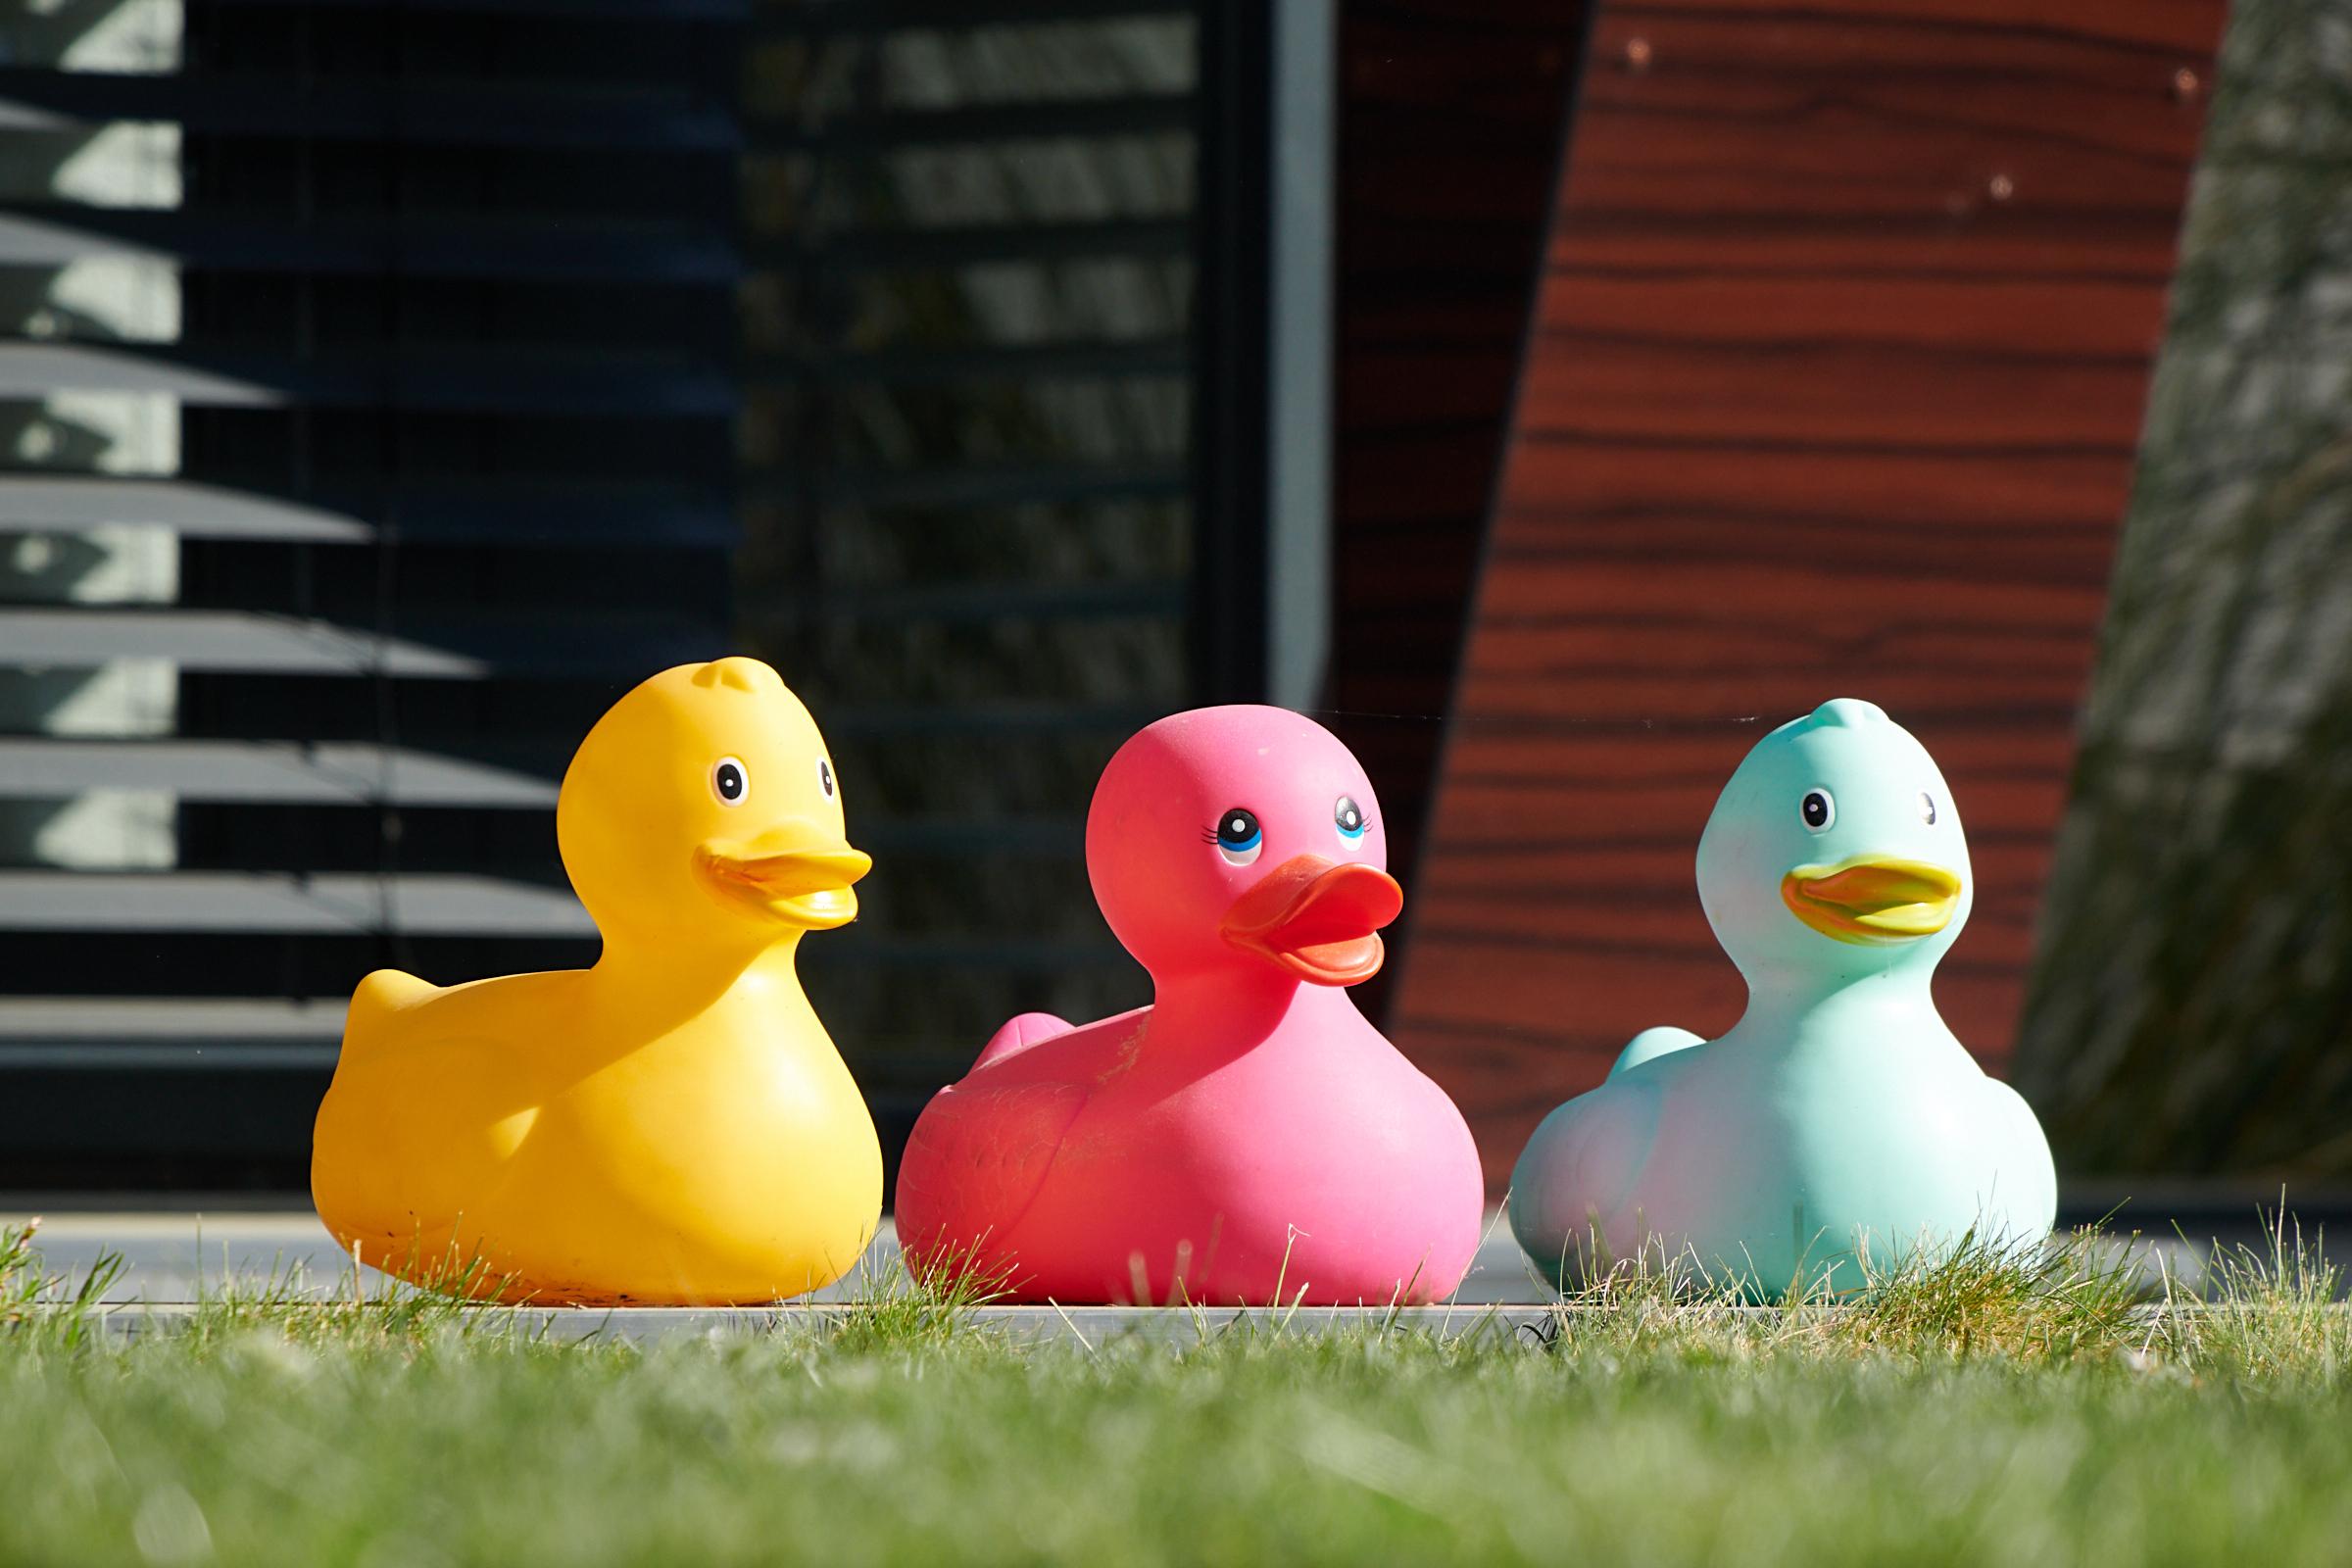 April 2020: drei fröhliche Enten